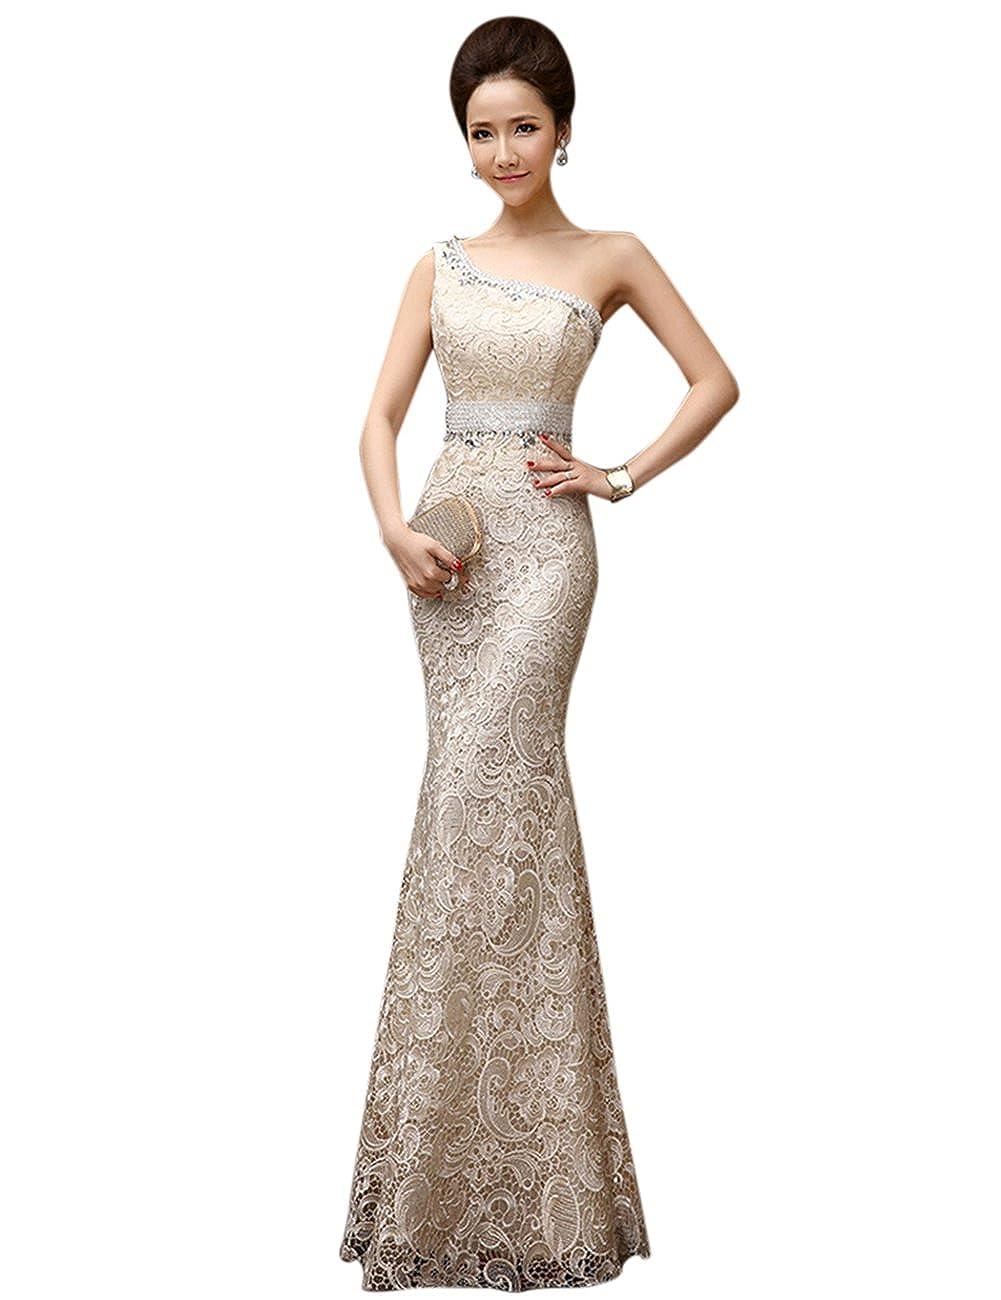 Champagne BessWedding Sexy Mermaid One Shoulder Lace Prom Dress Wedding with Rhine Stone